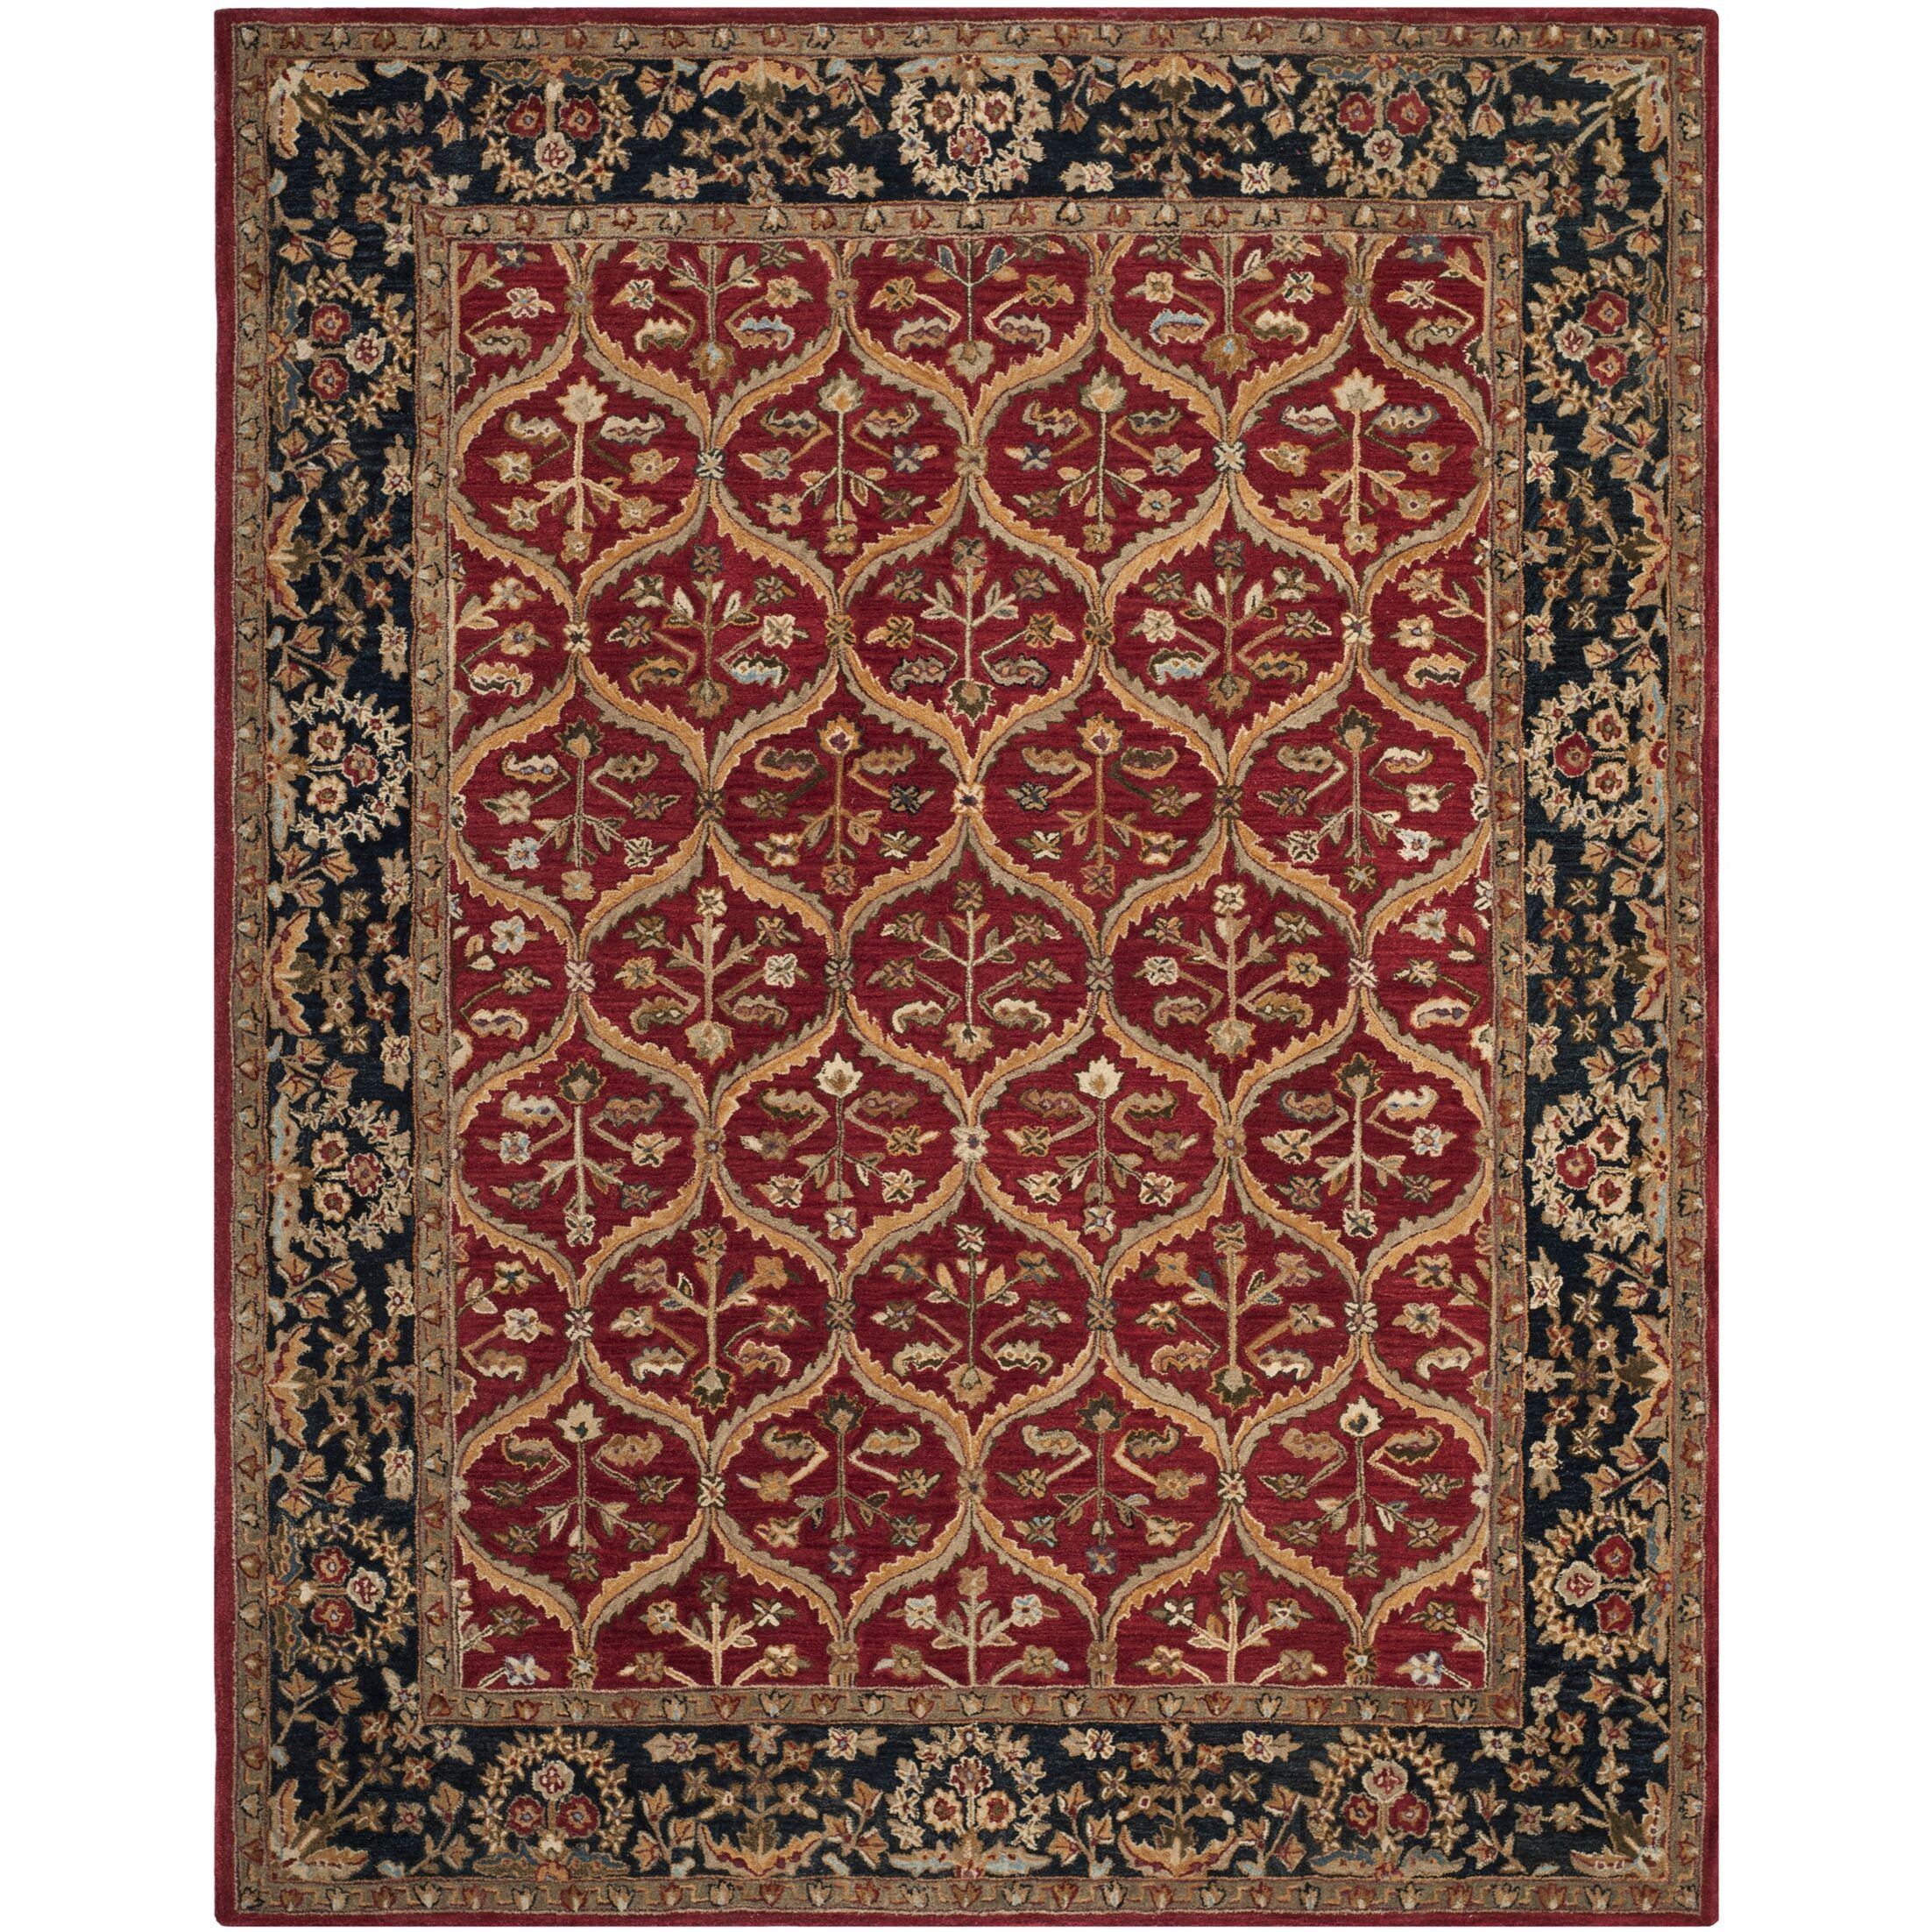 Anatolia Red Area Rug Rug Size: Rectangle 5' x 8'